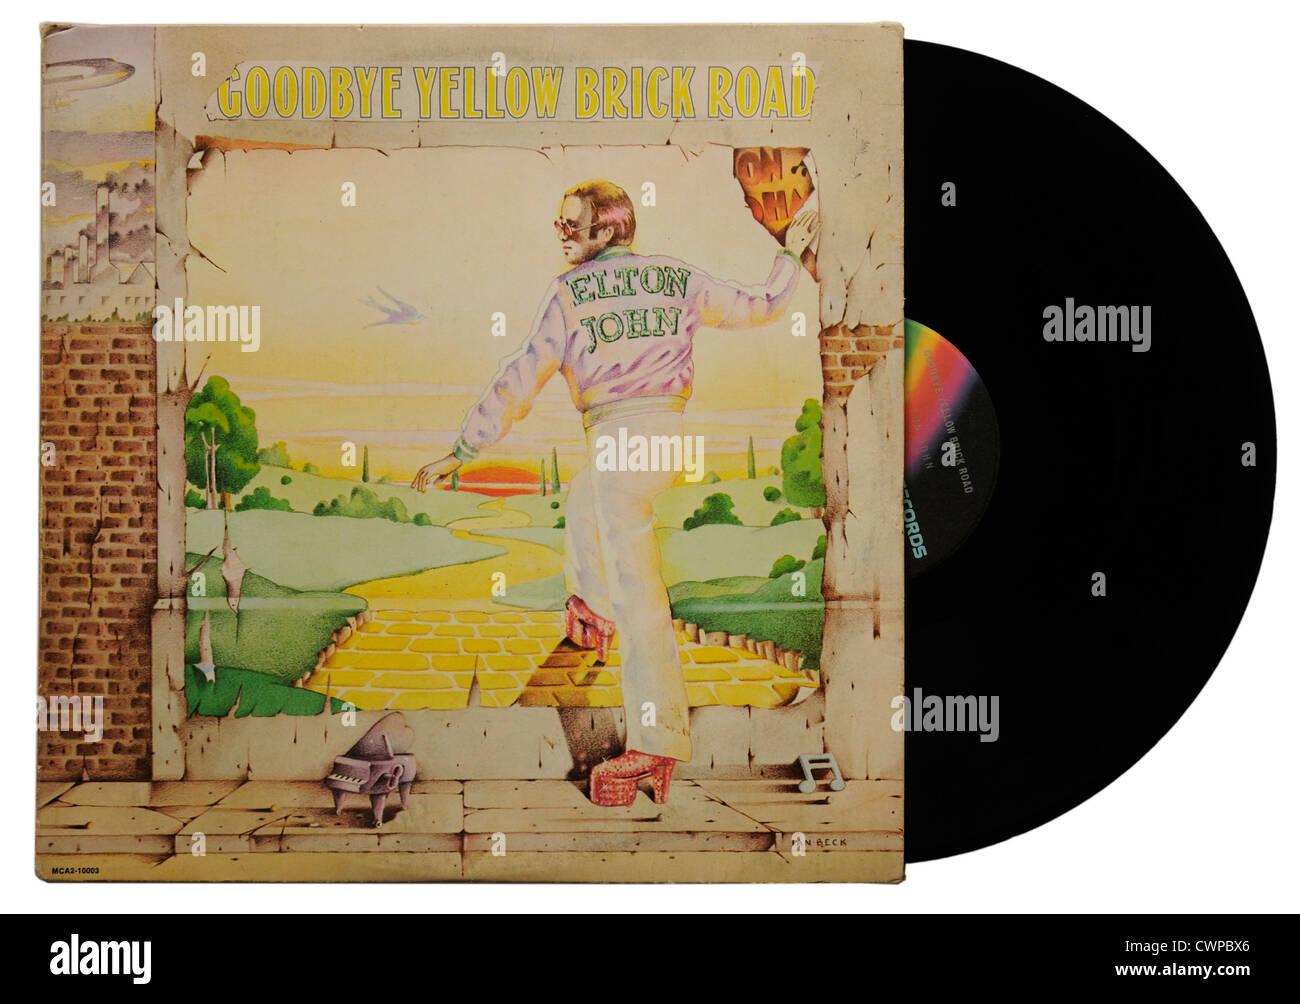 Elton John Goodbye Yellow Brick Road album - Stock Image